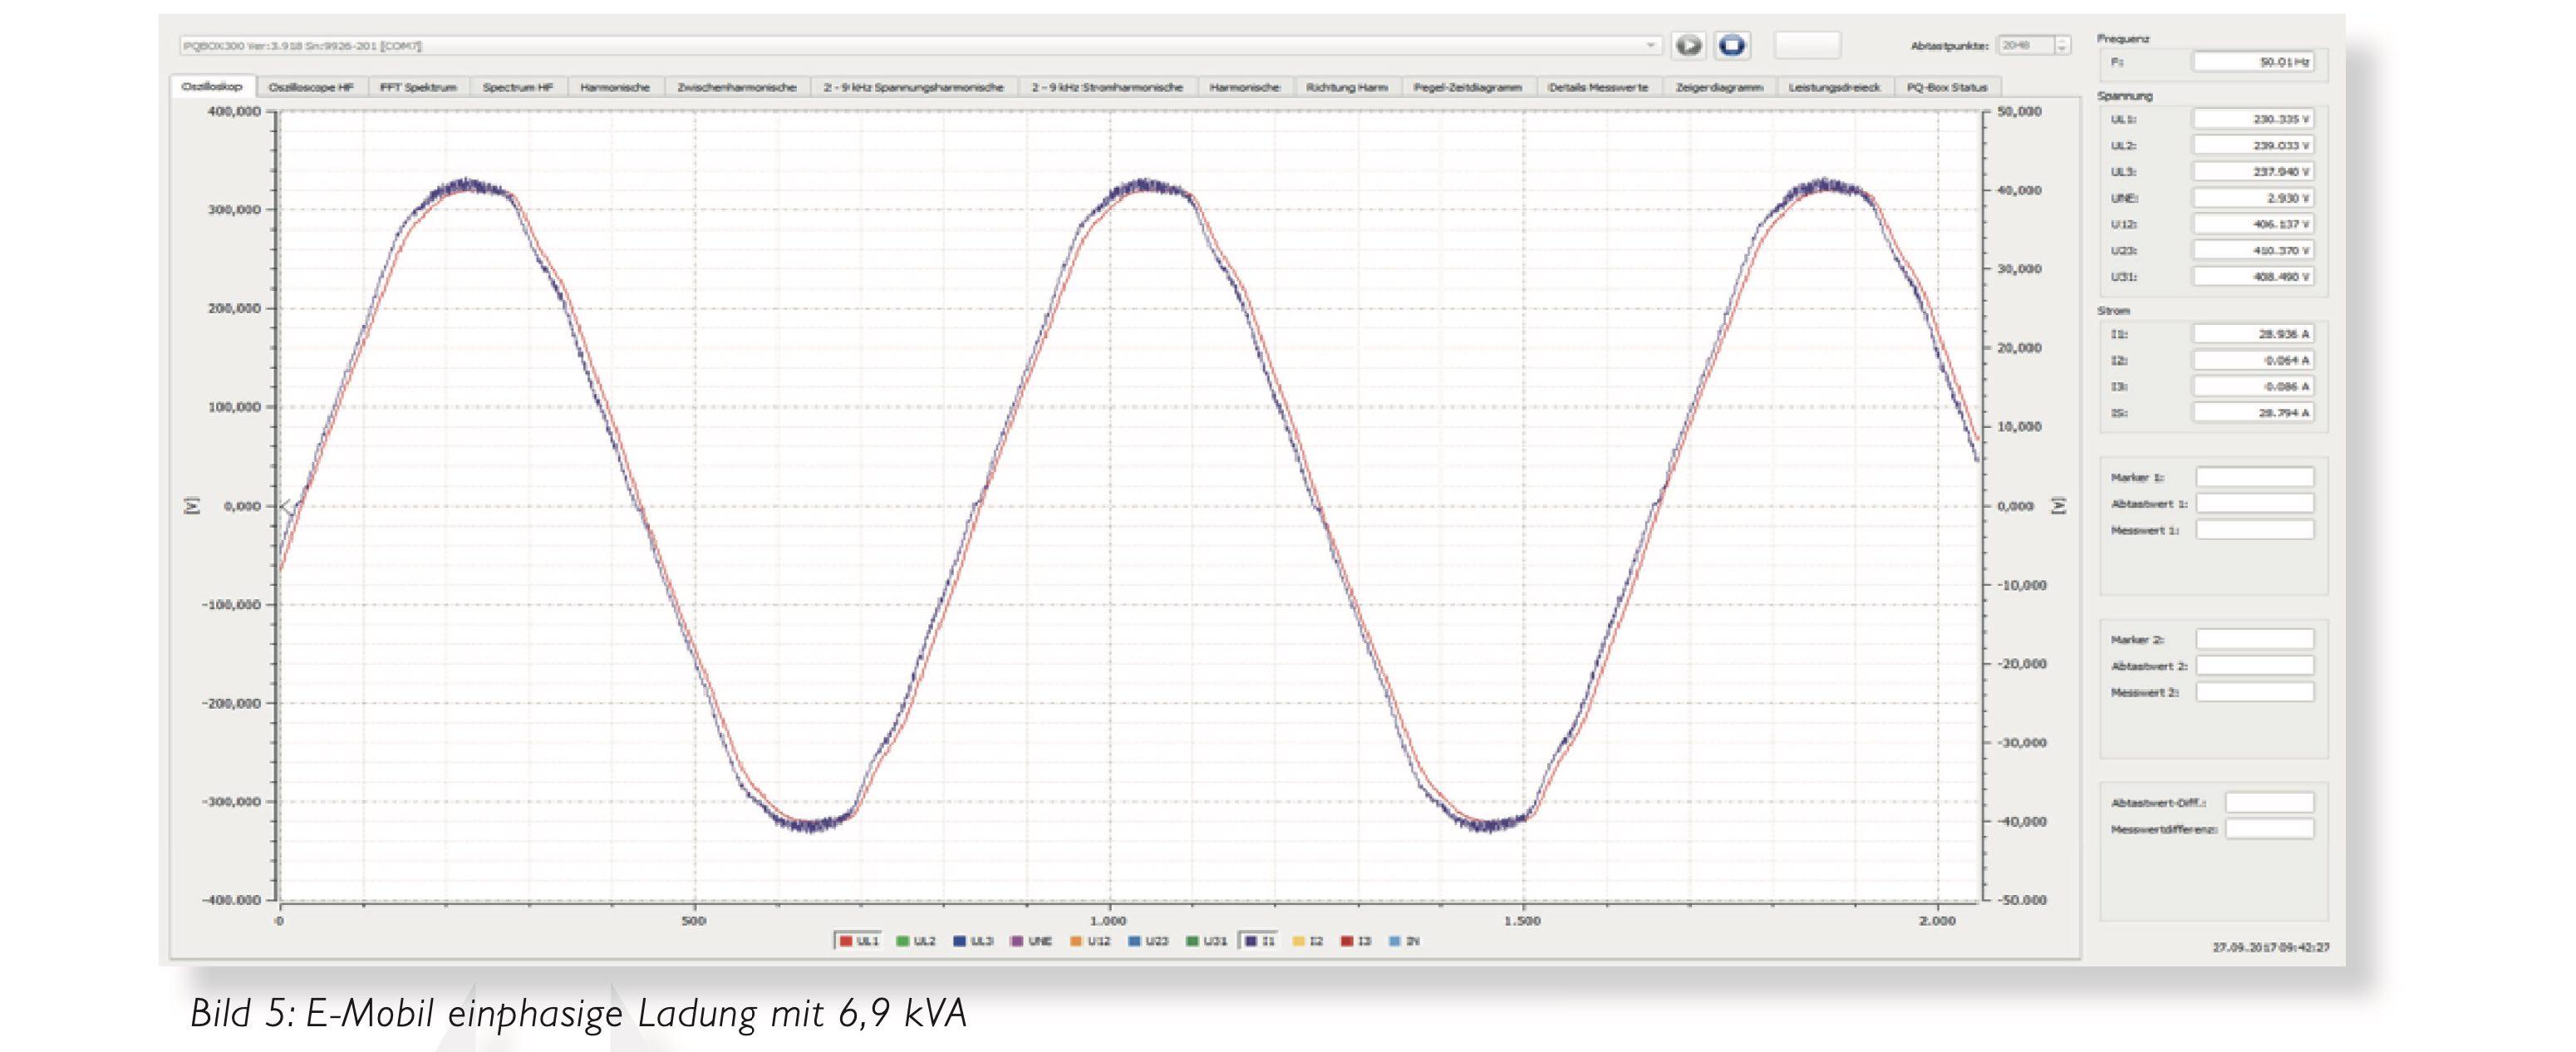 Supraharmonische Oberschwingungen E-Mobility Ladesäule